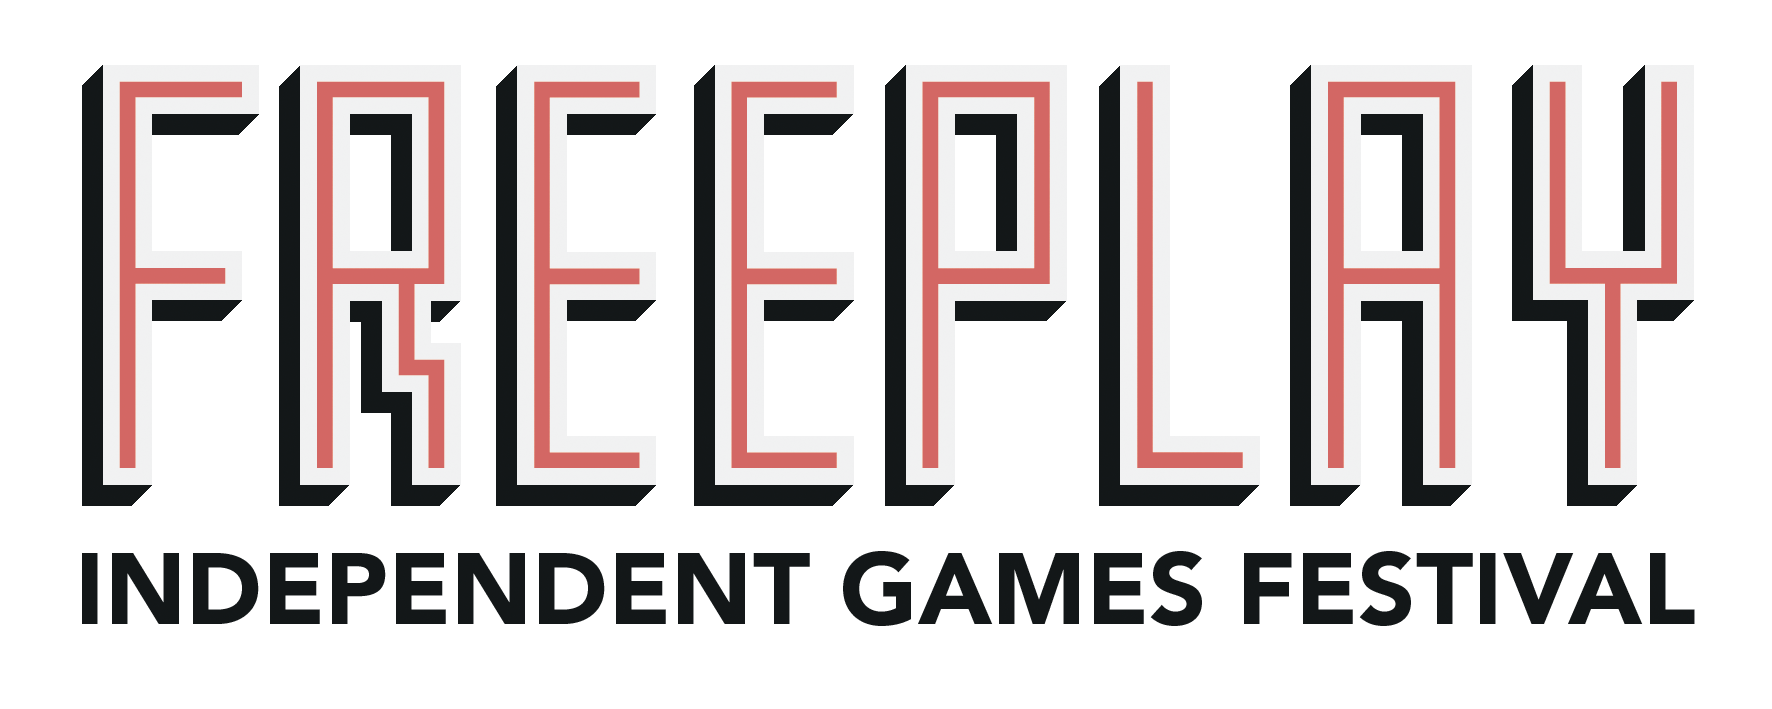 Freeplay logo